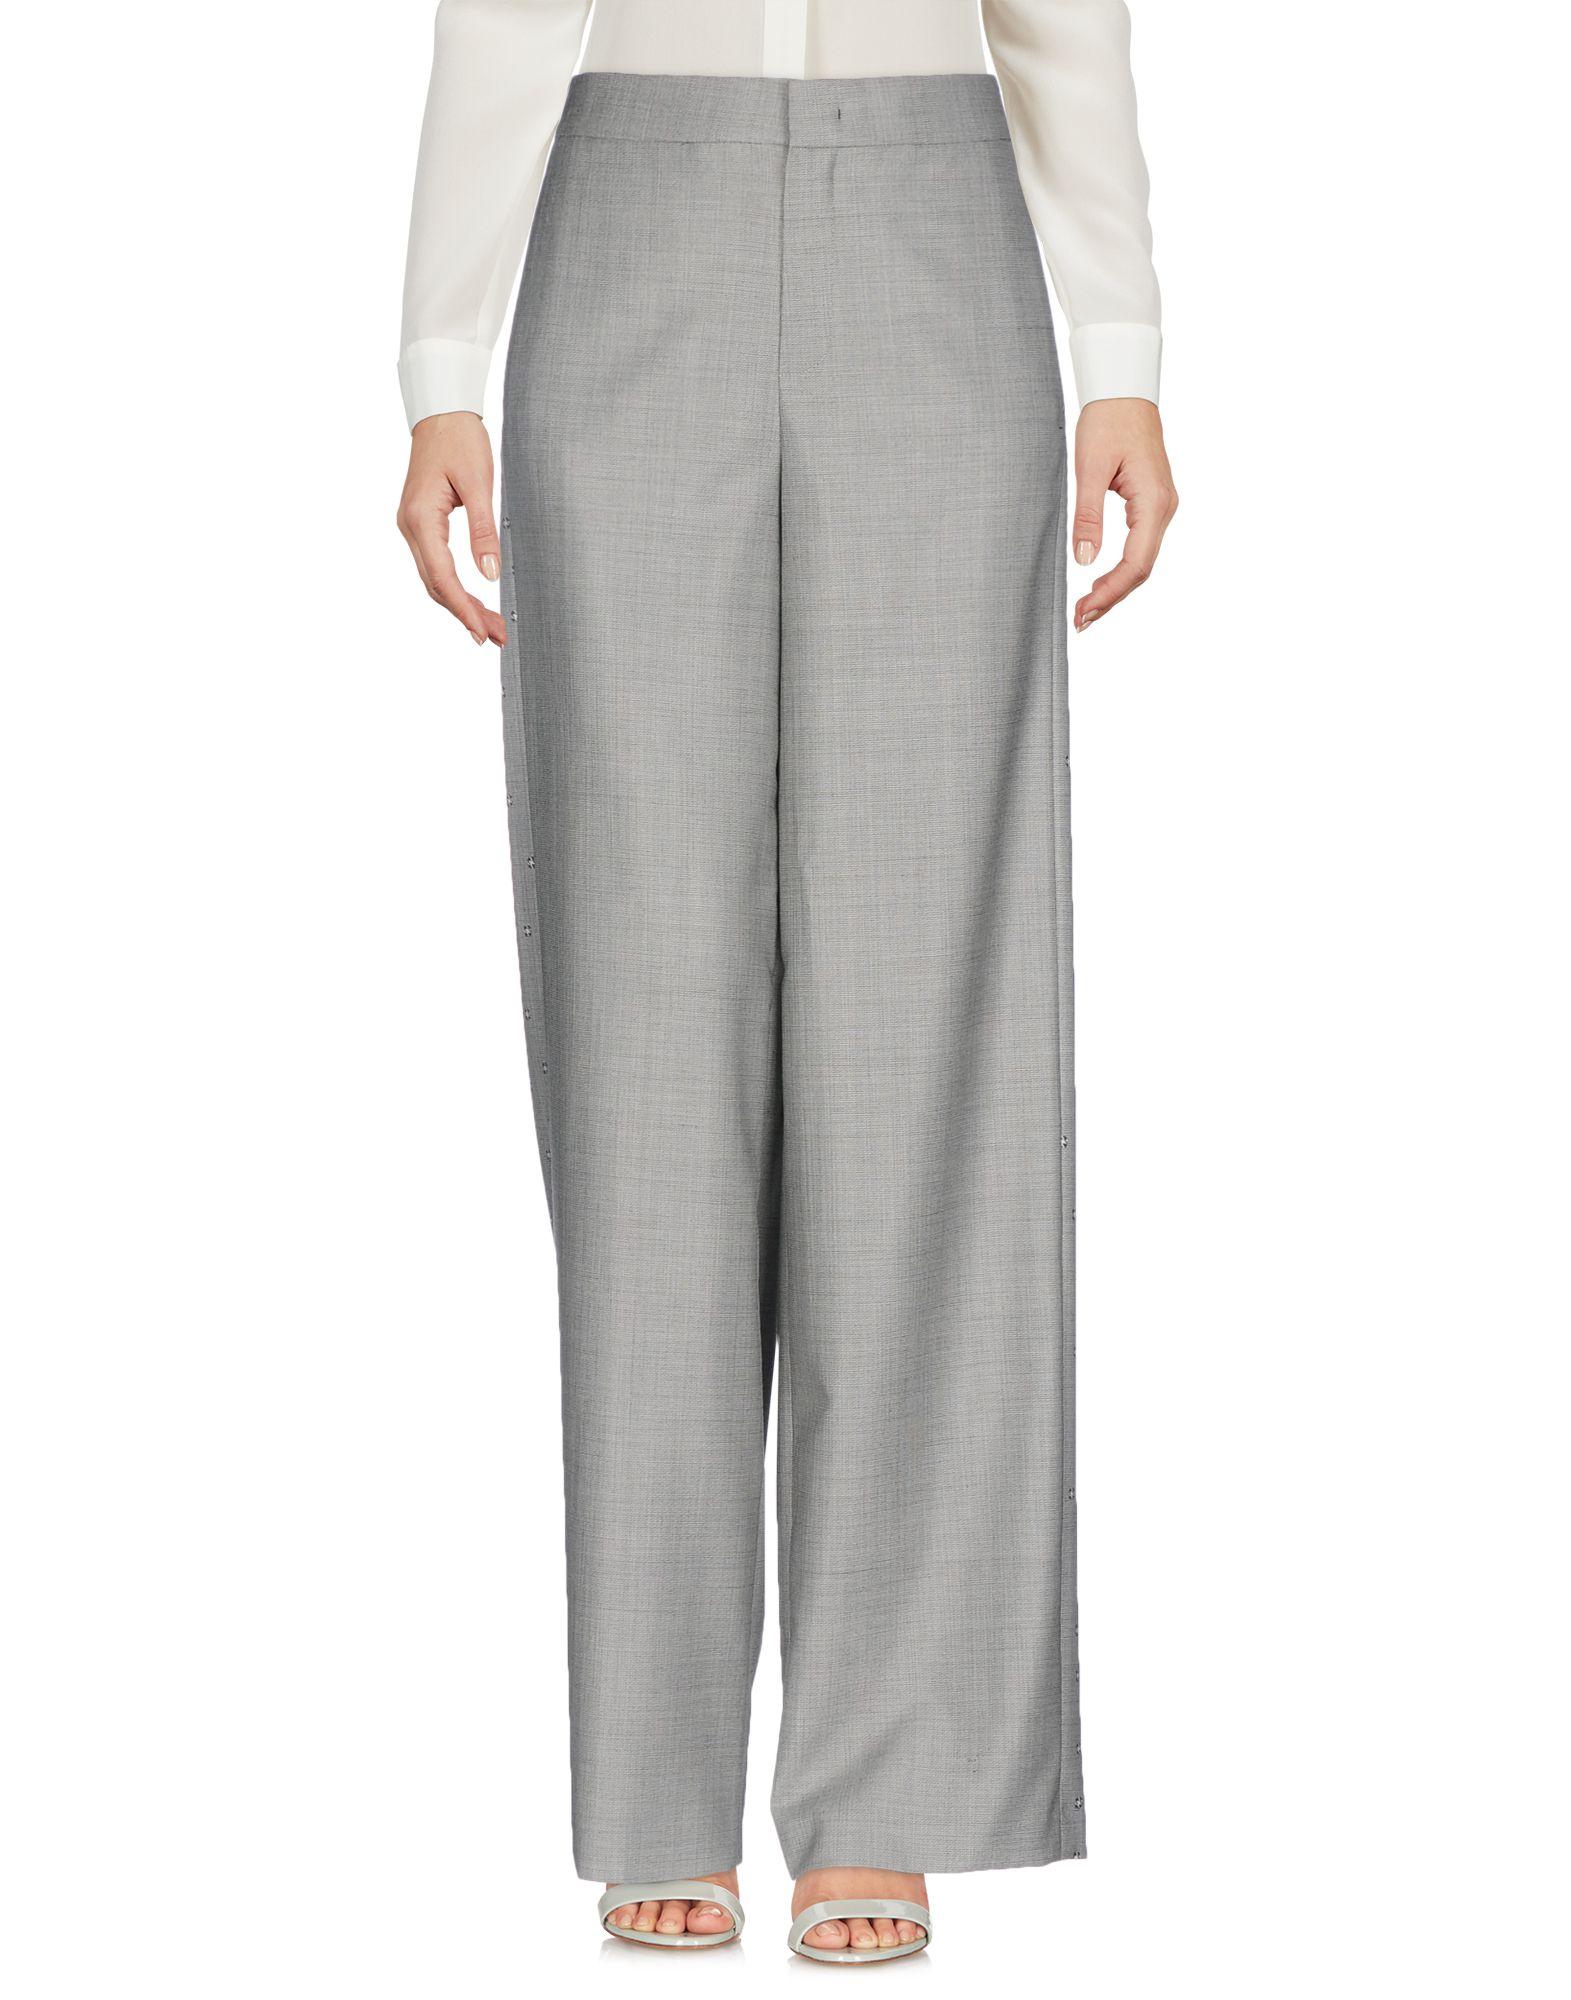 Pantalone Strenesse Donna - Acquista online su